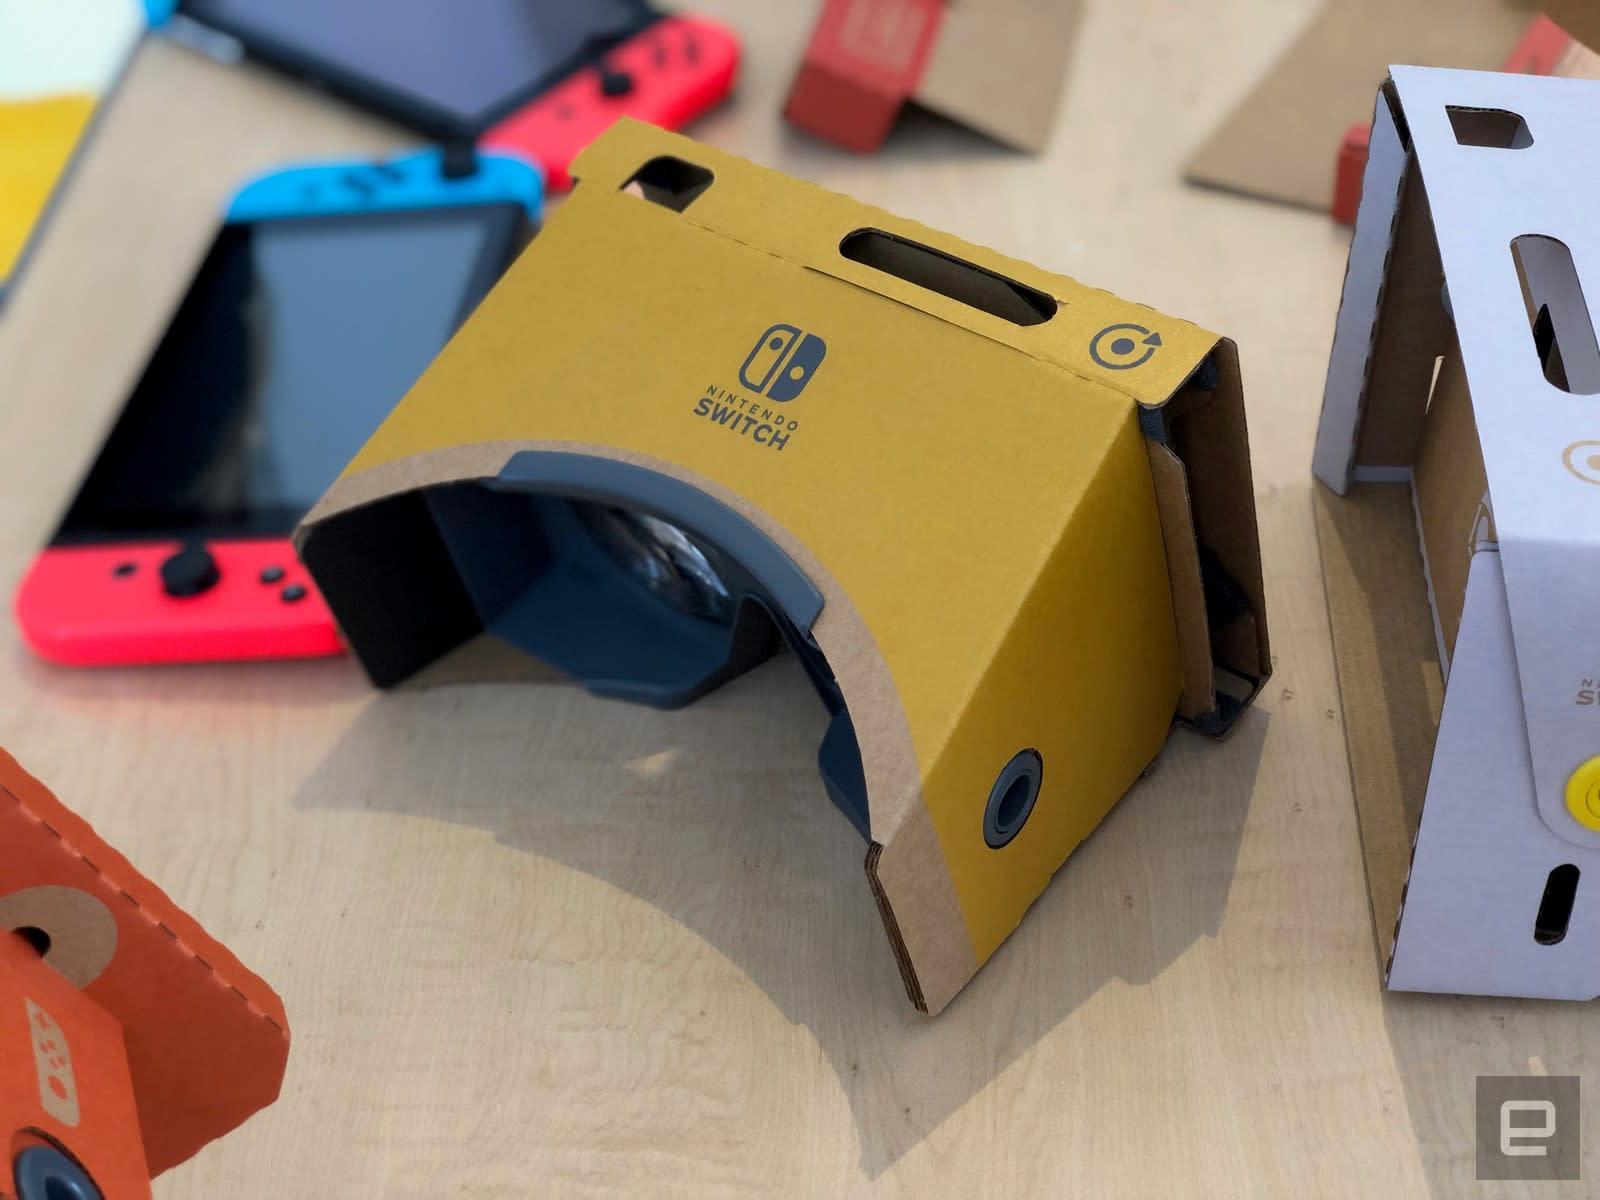 Nintendo Labo VR Kit for Switch